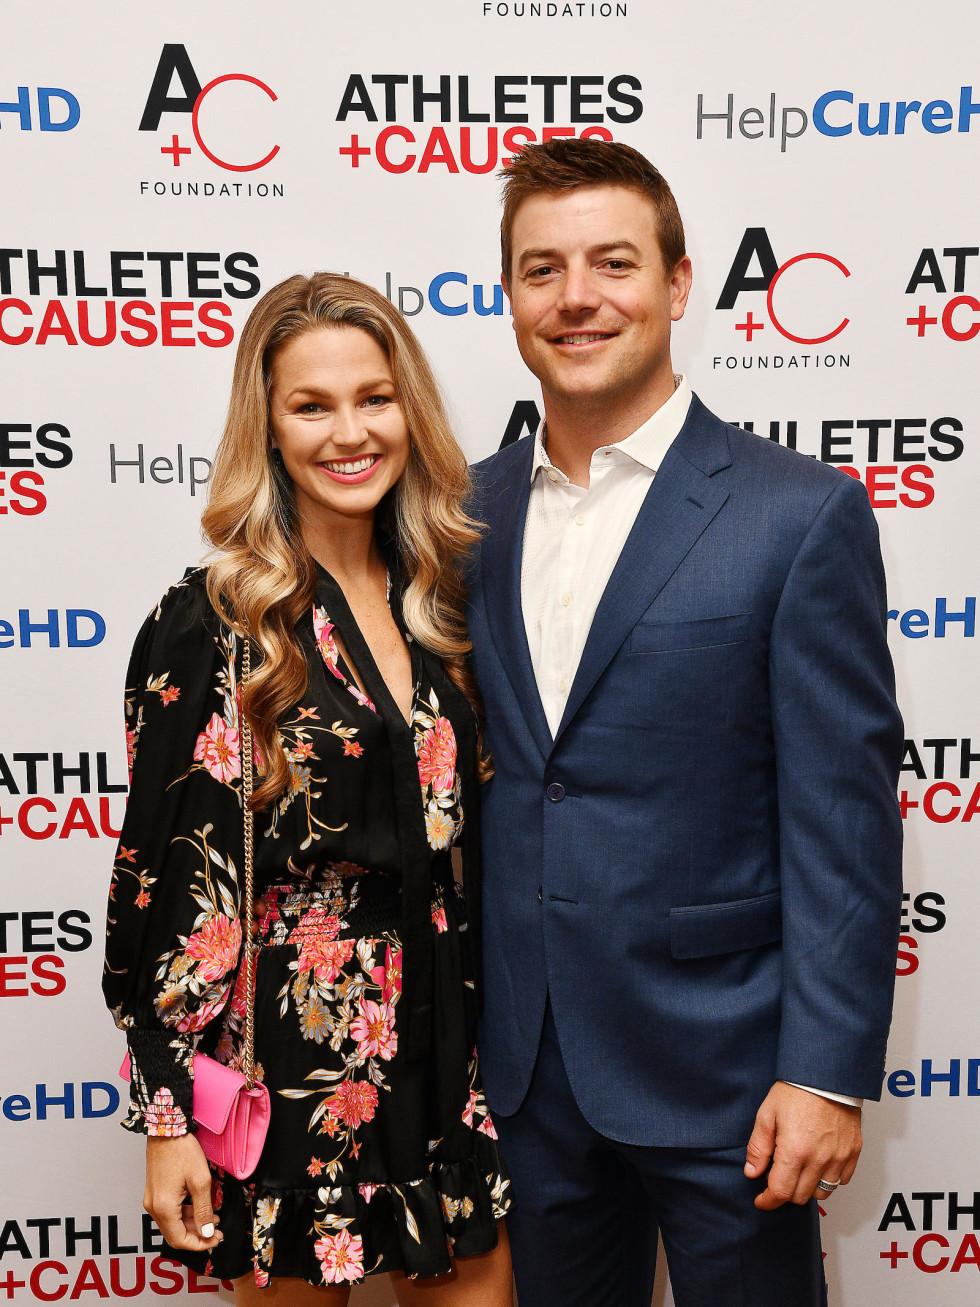 Allie LaForce Joe Smith Houston Astros Help Cure HD luncheon gala